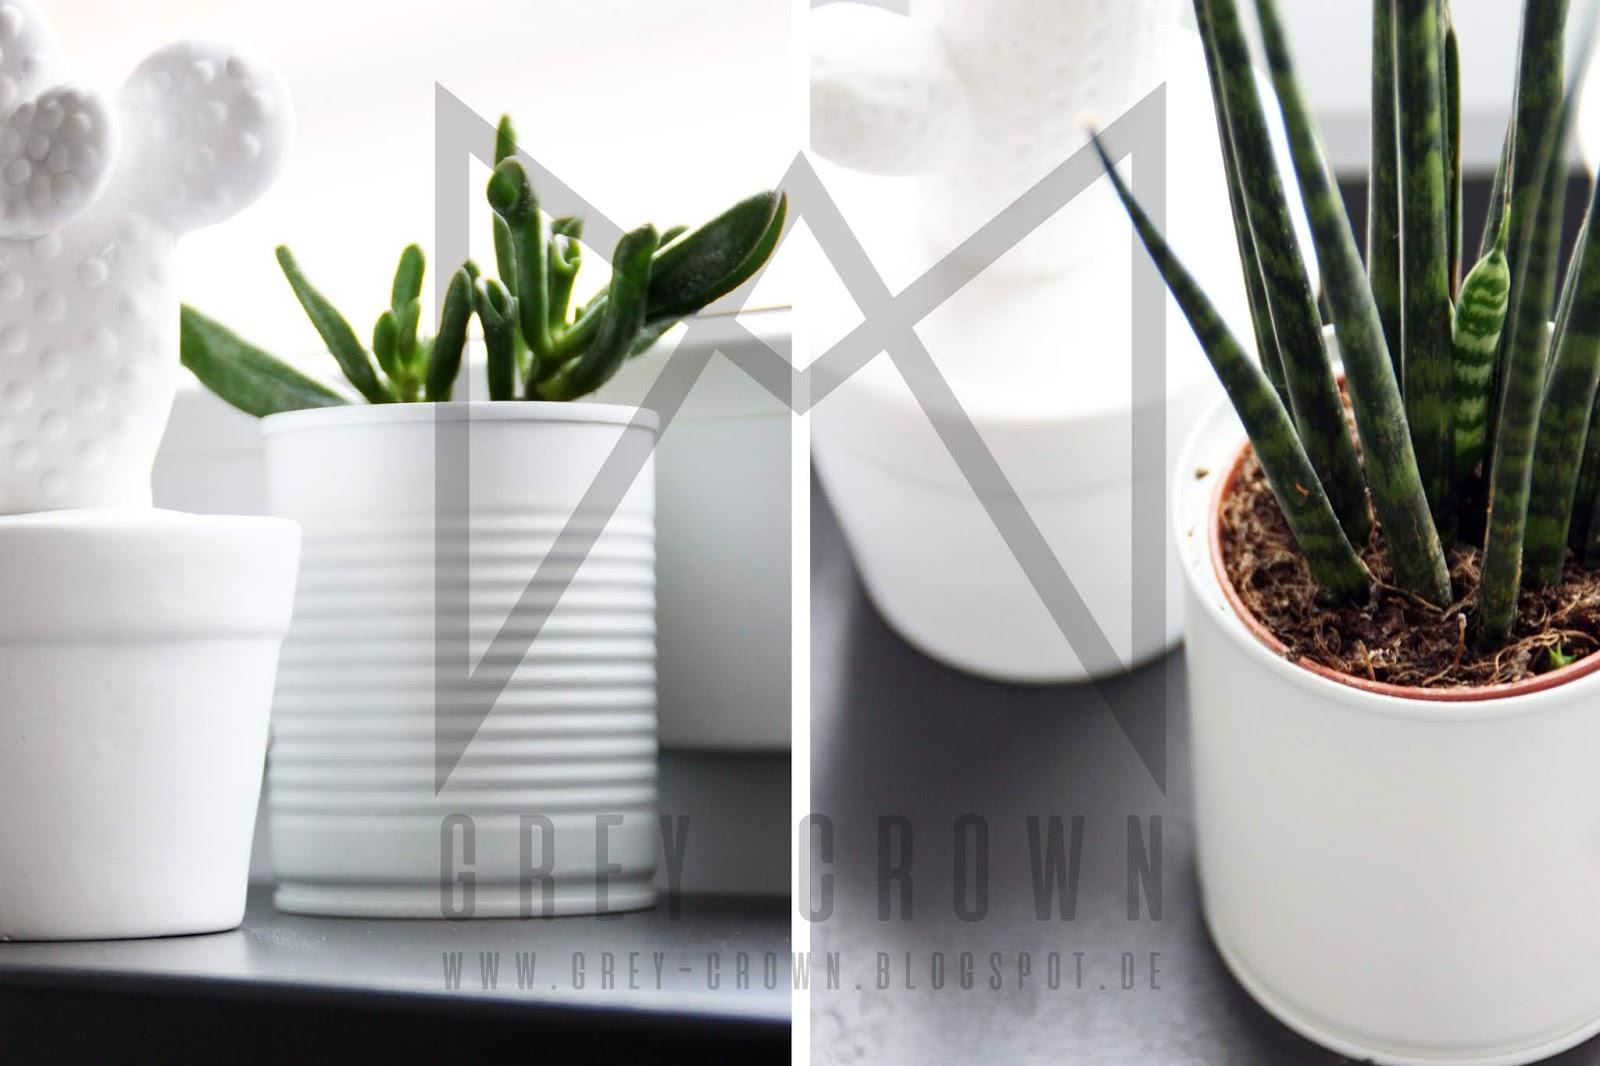 grey crown 3 einfache diy ideen blechdosen upcycling. Black Bedroom Furniture Sets. Home Design Ideas